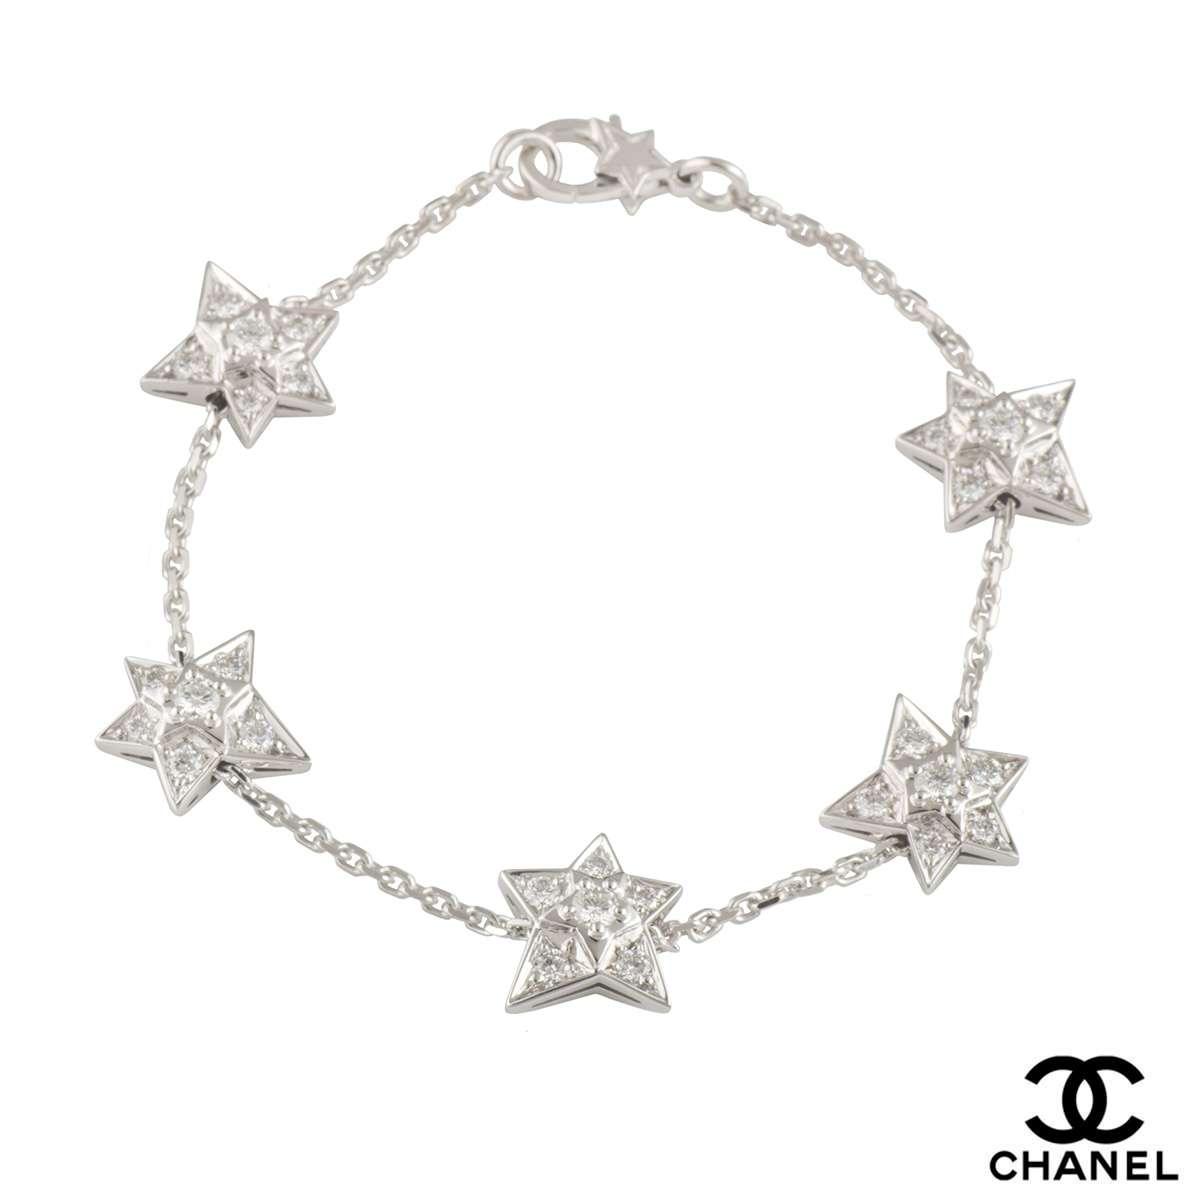 Chanel White Gold Diamond Comete Bracelet 0.90ct D-F/VVS1